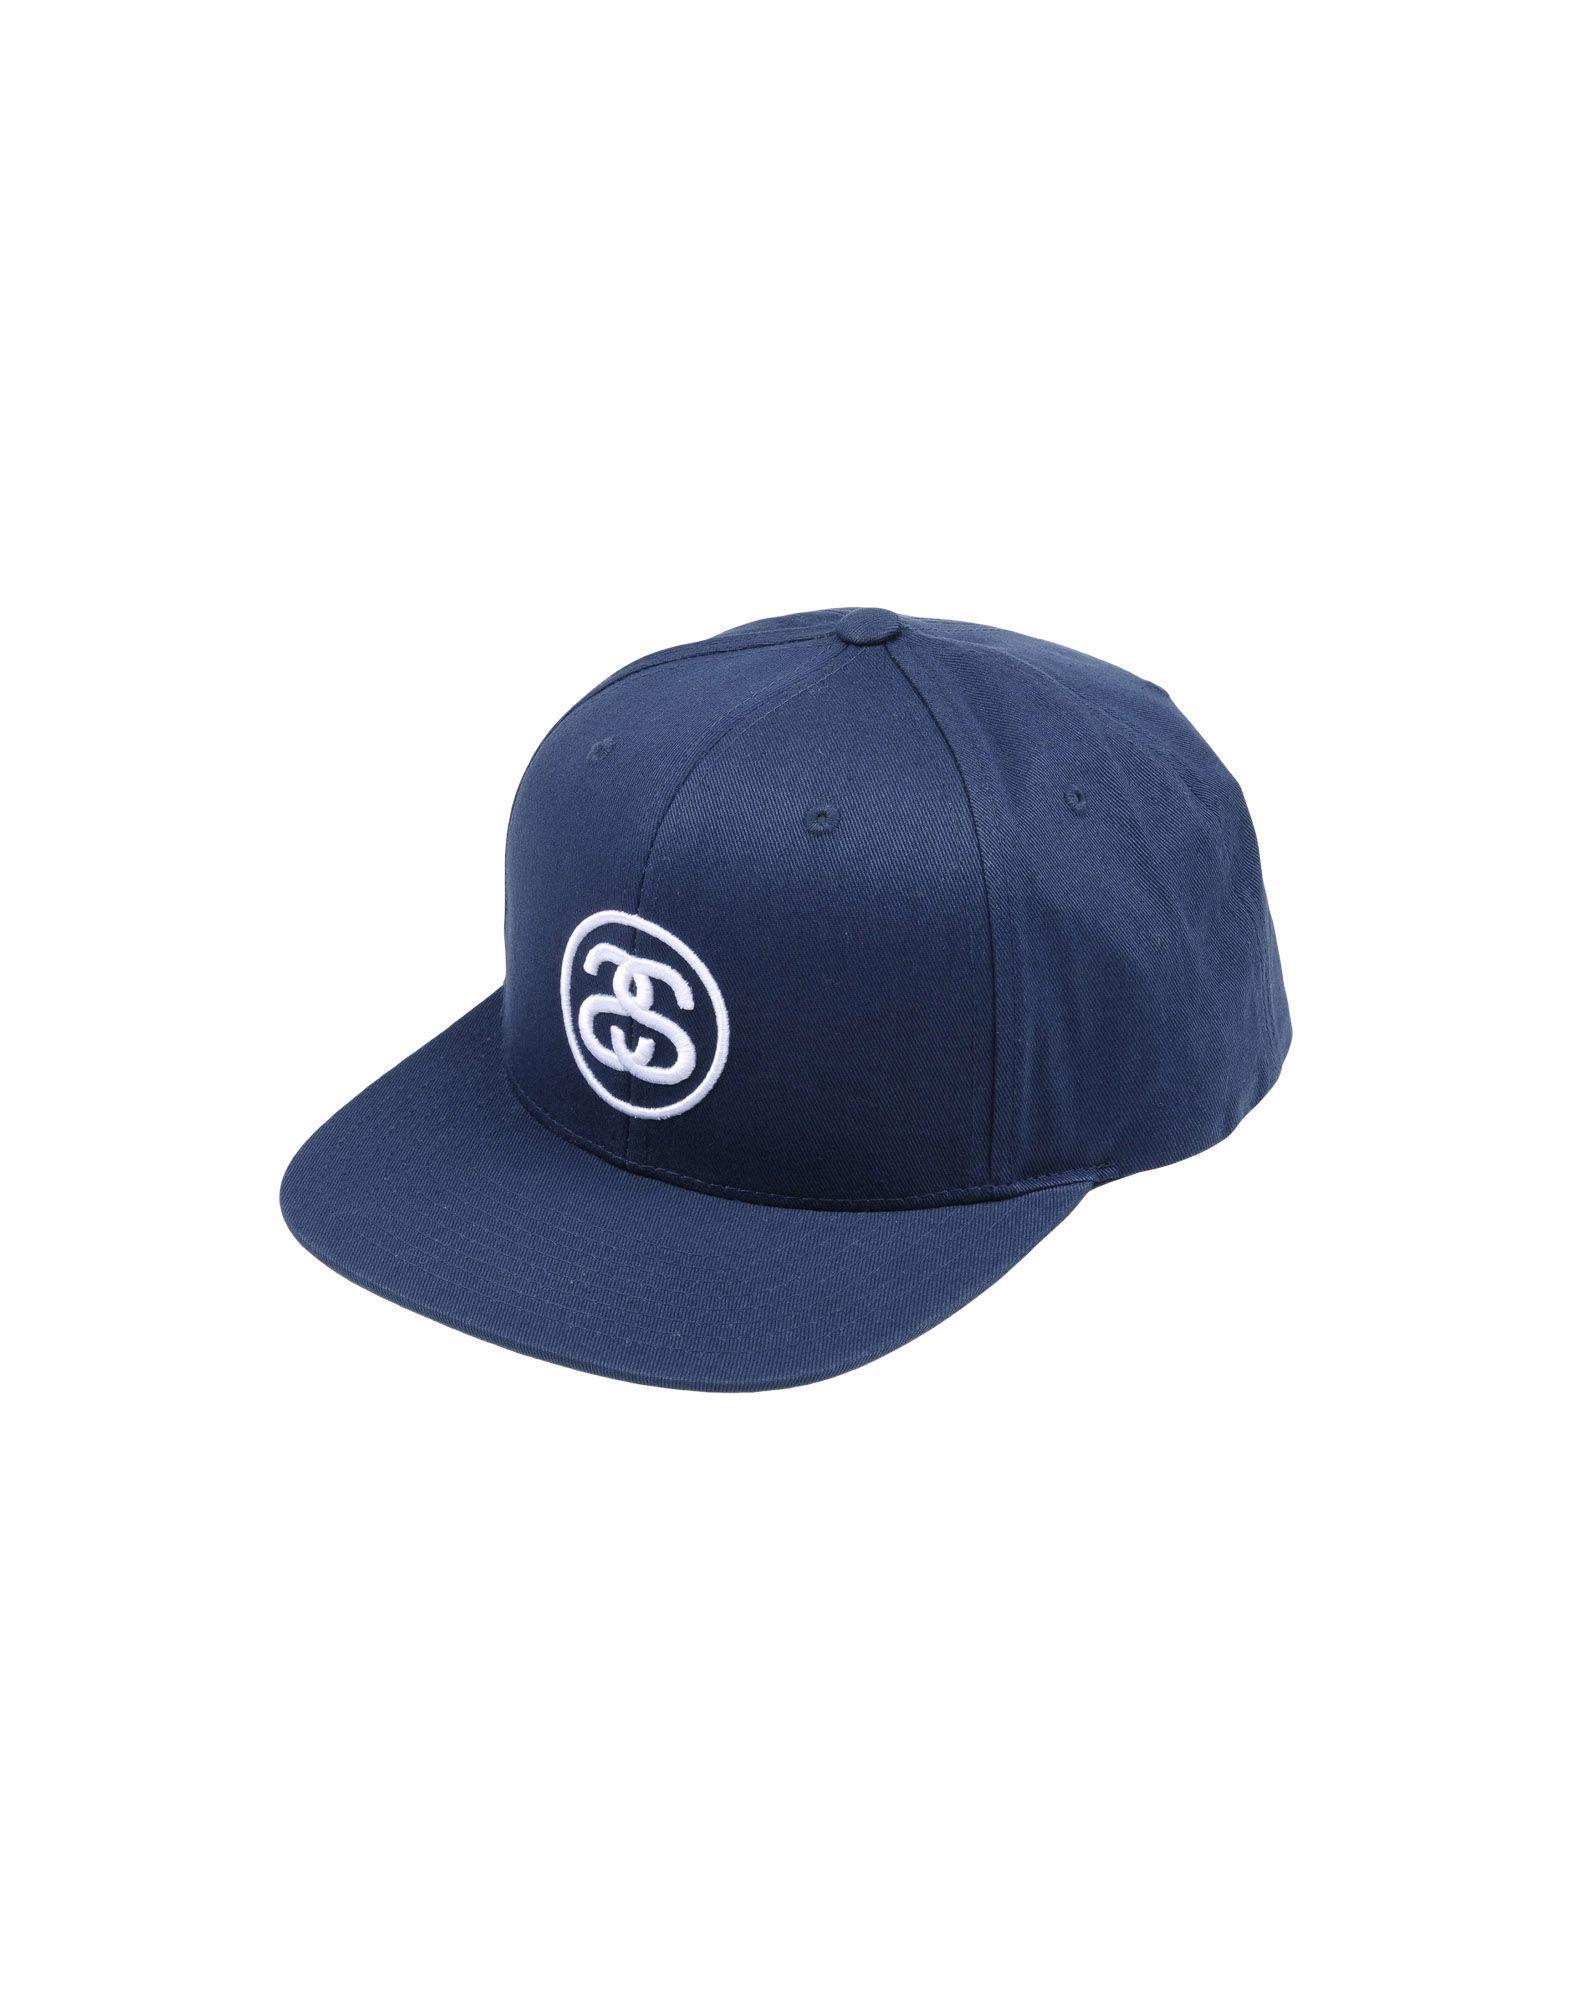 b3960a5e4ee Stussy Hat In Dark Blue